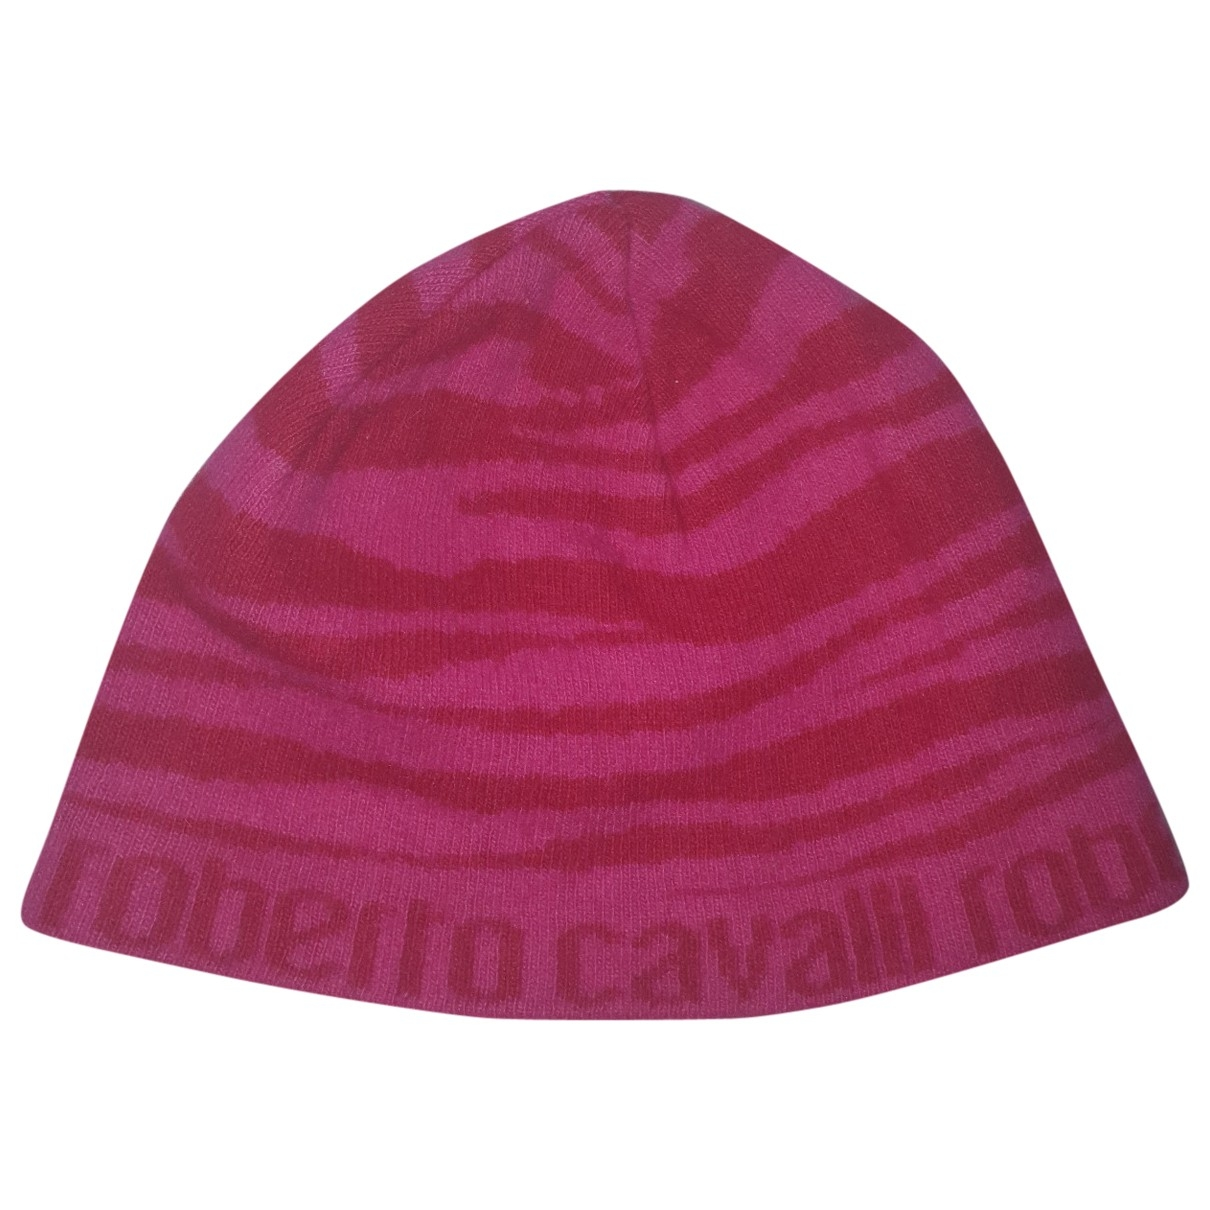 Roberto Cavalli \N Multicolour Wool hat for Women S International